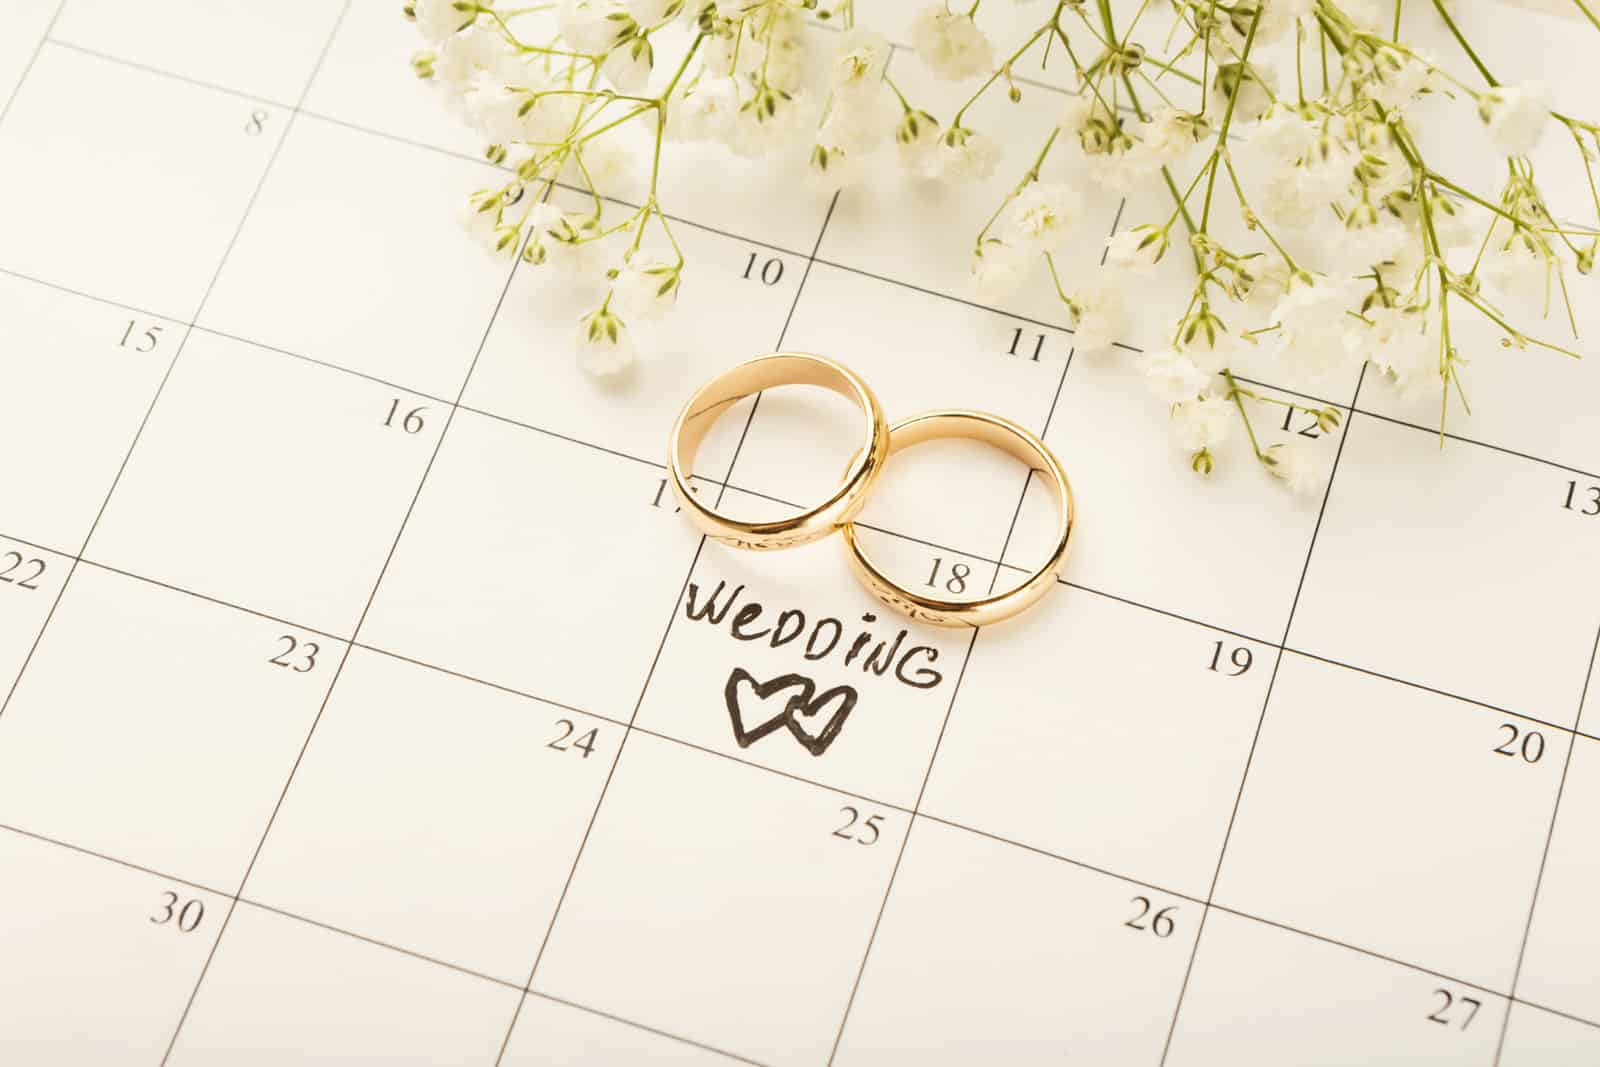 wedding rings on a calendar